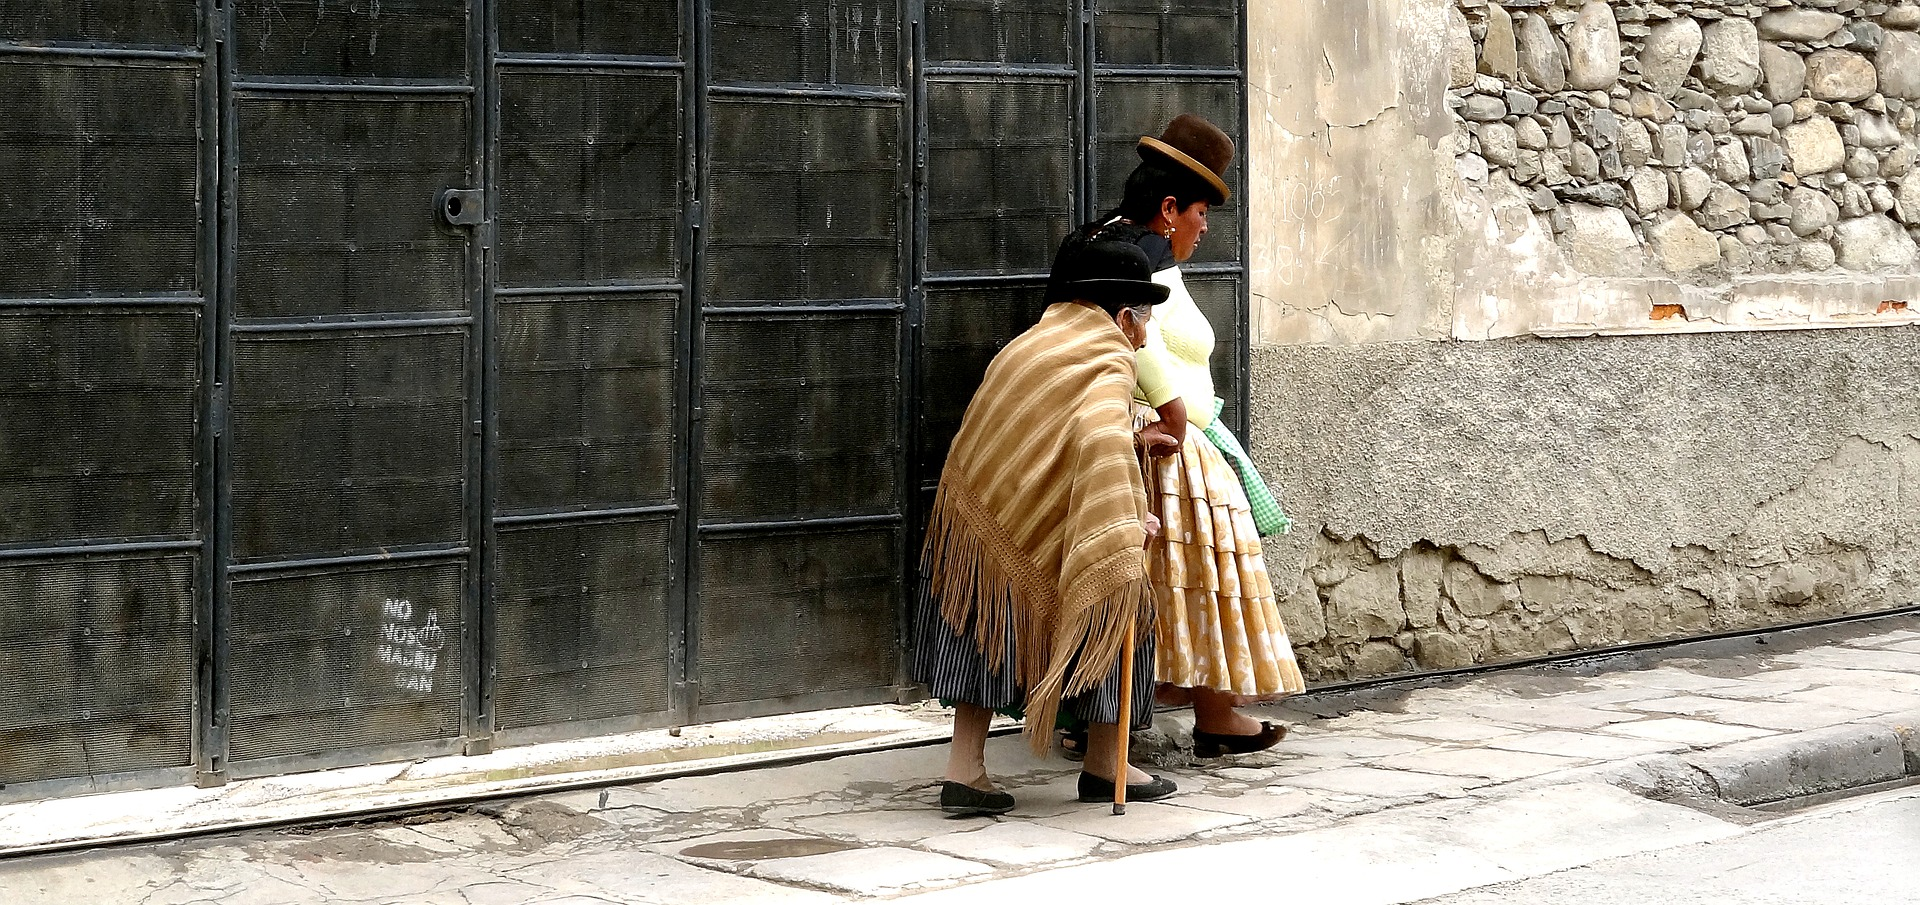 La Paz Vs Santa Cruz Which City Is For You